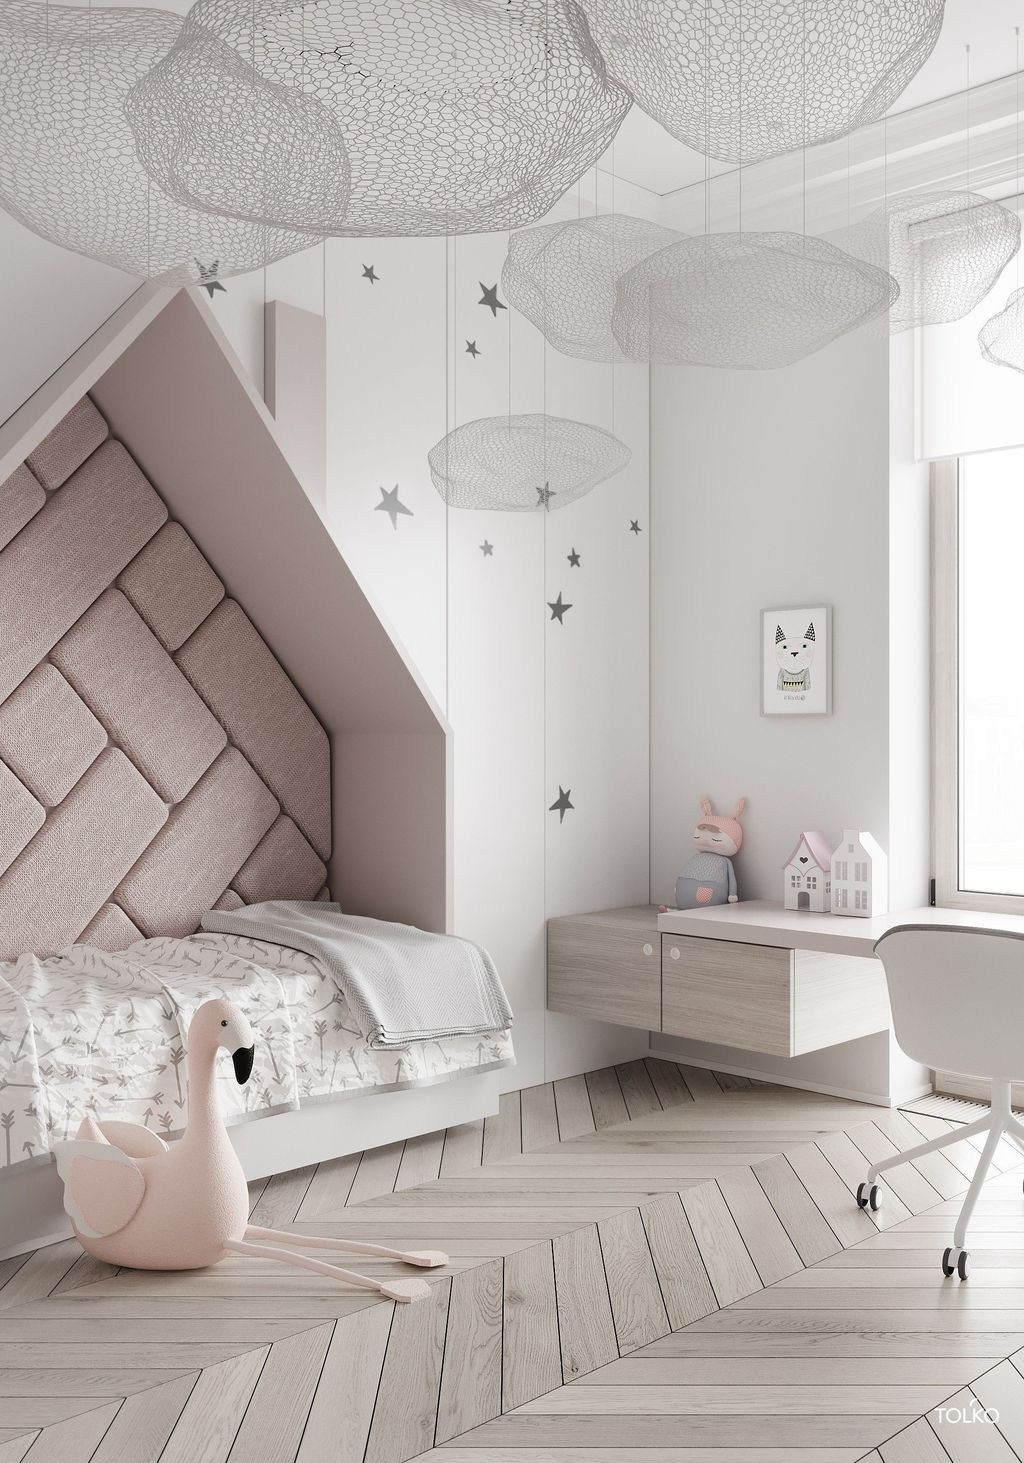 Modern Kids Room Designs For Your Modern Home05 Child Bedroom Layout Cool Kids Bedrooms Modern Kids Room Design Modern kids bedroom designs